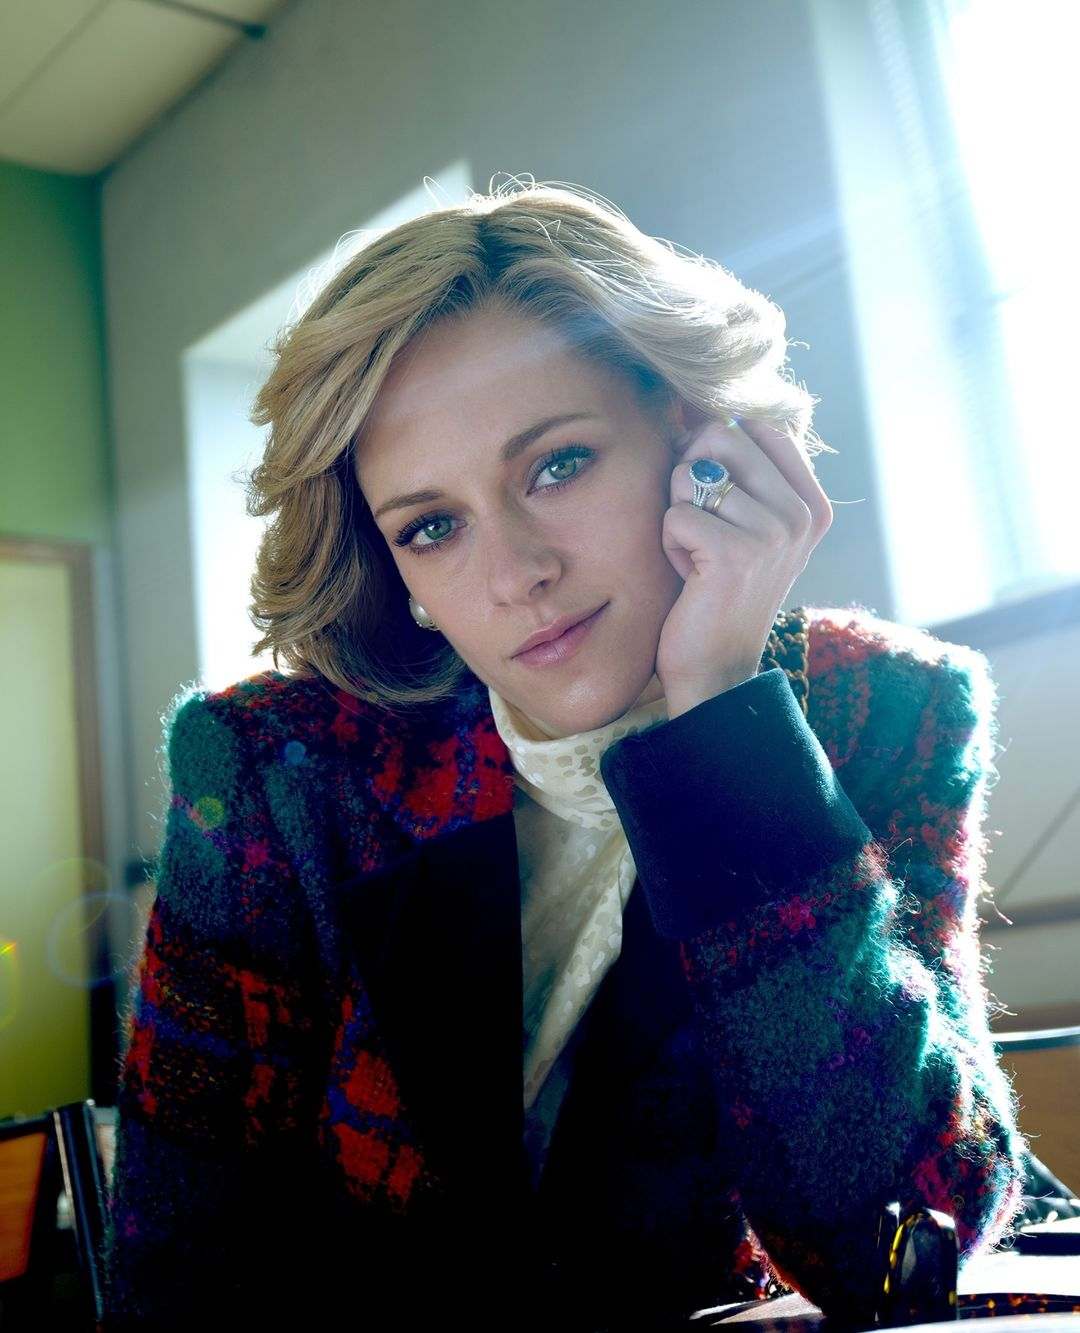 Kristen Stewart as Princess Diana in 'Spencer' Film